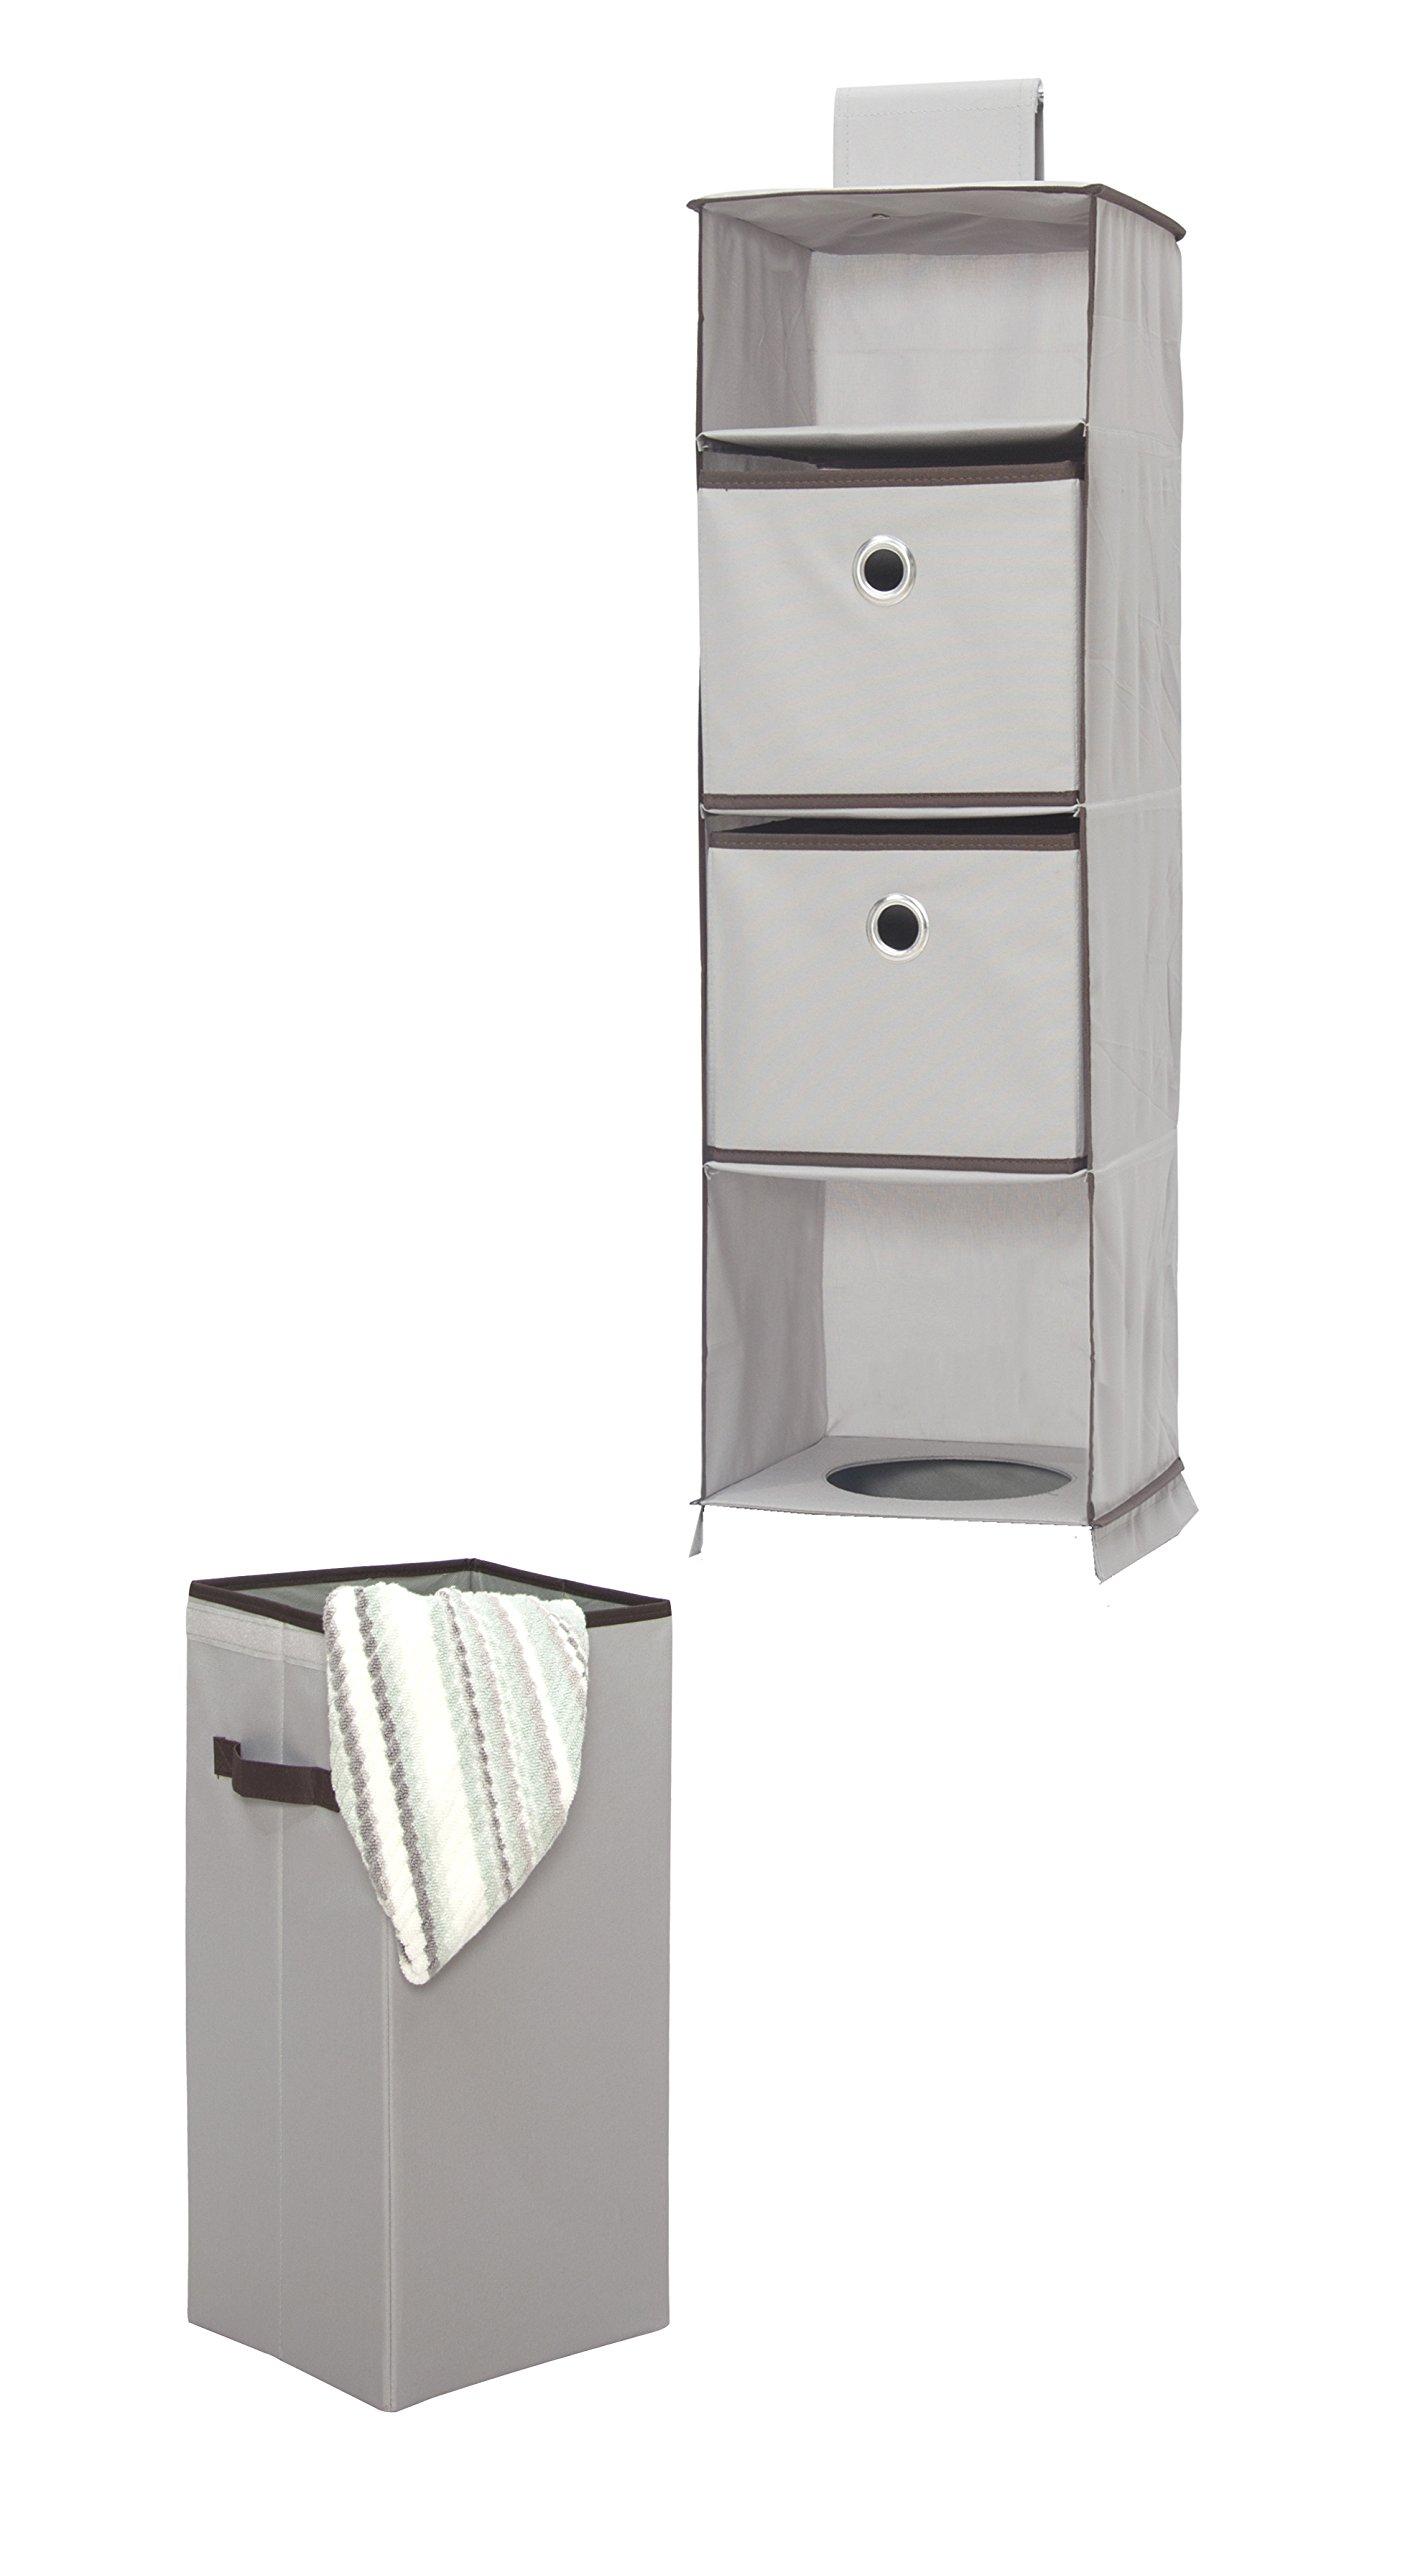 STORAGE MANIAC Hanging Closet Organizer with Removable Laundry Basket, 2 Drawers, 1 Laundry Bin, Gray